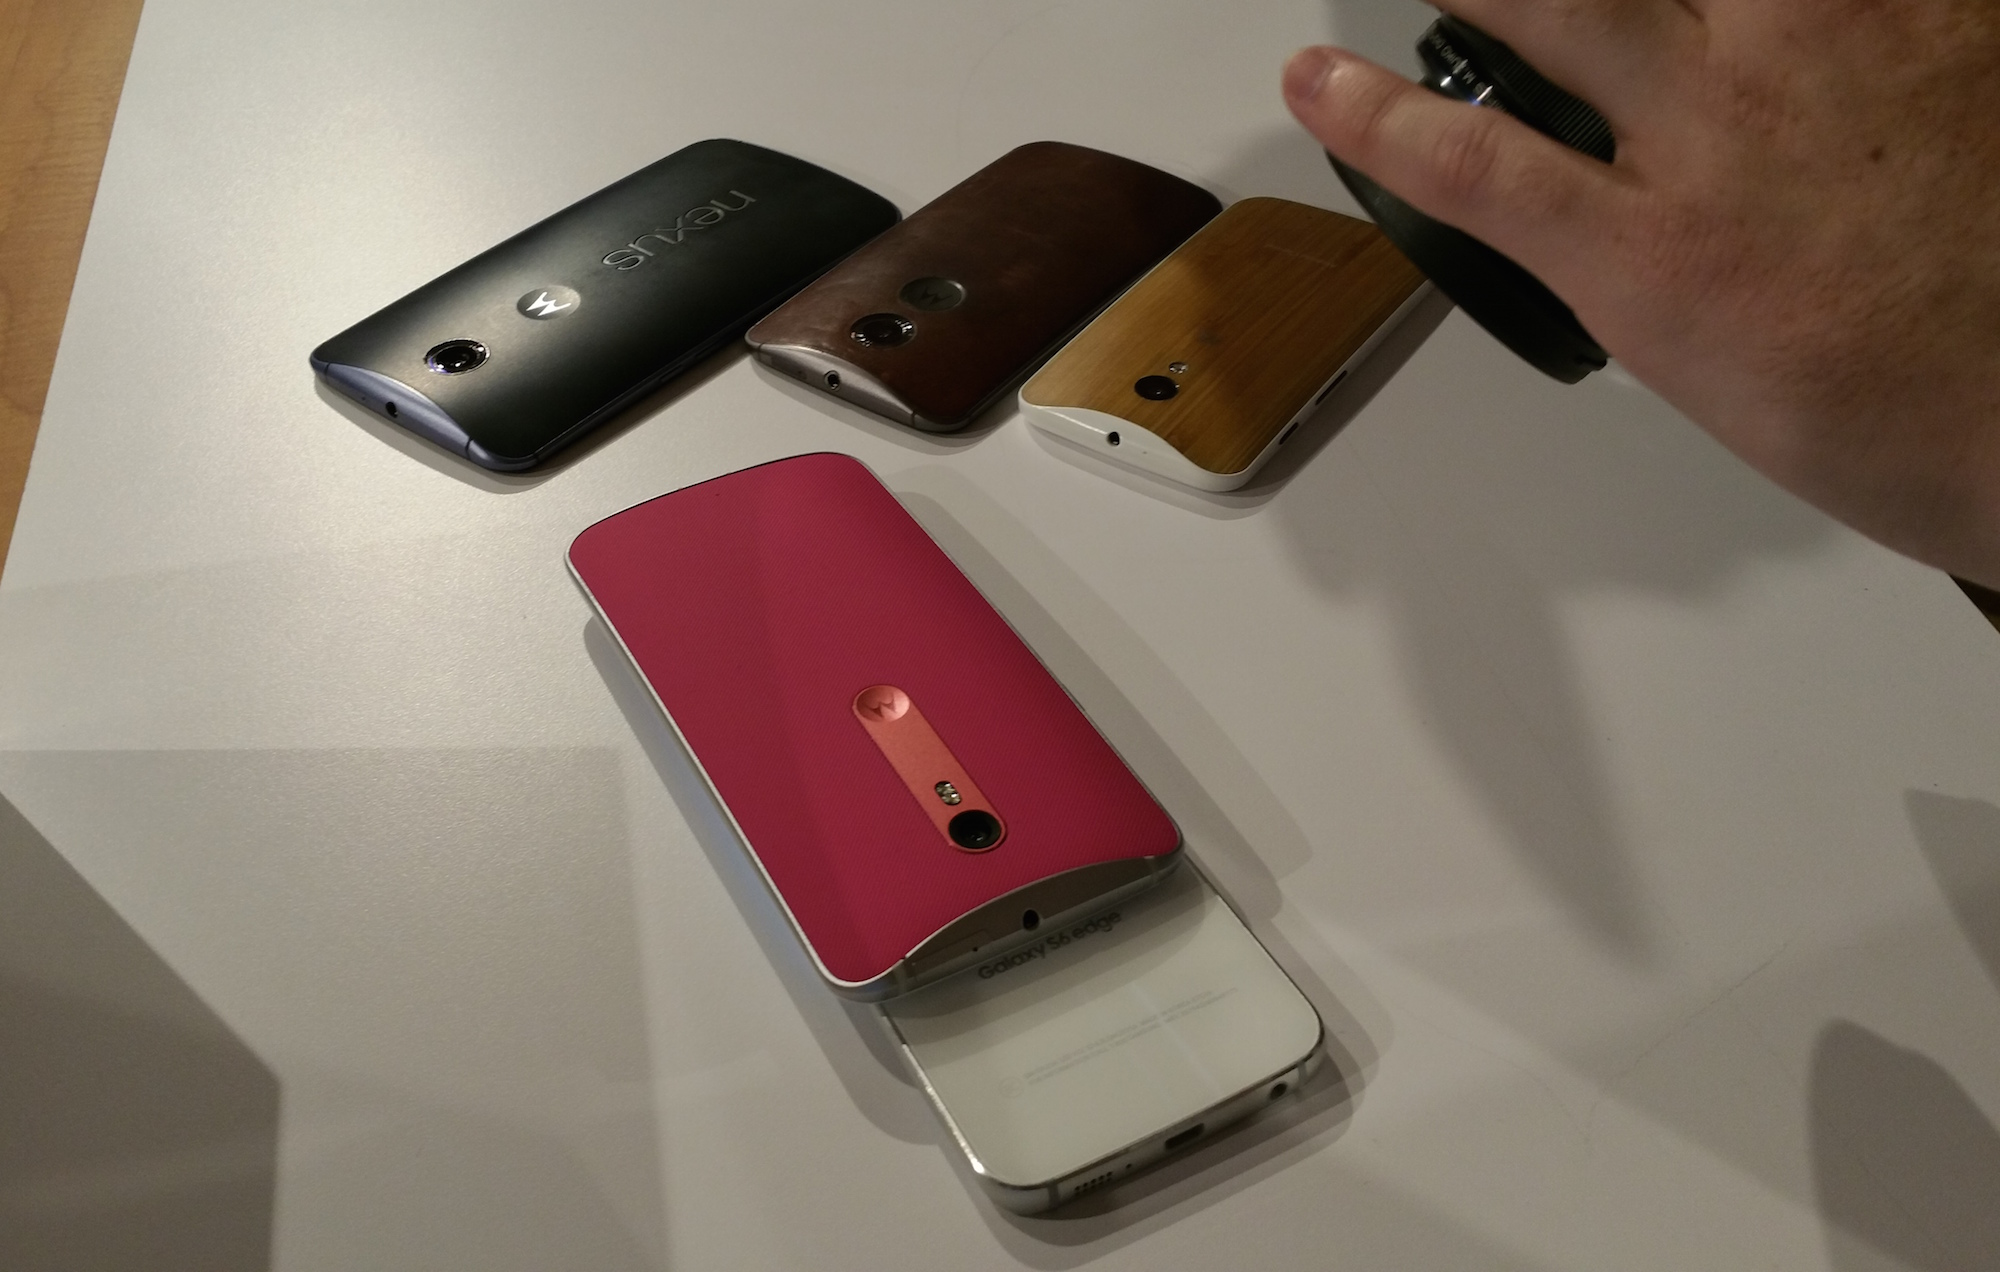 The Moto X Style atop a Samsung Galaxy S6, next to Nexus 6, Moto X (2015) and Moto G